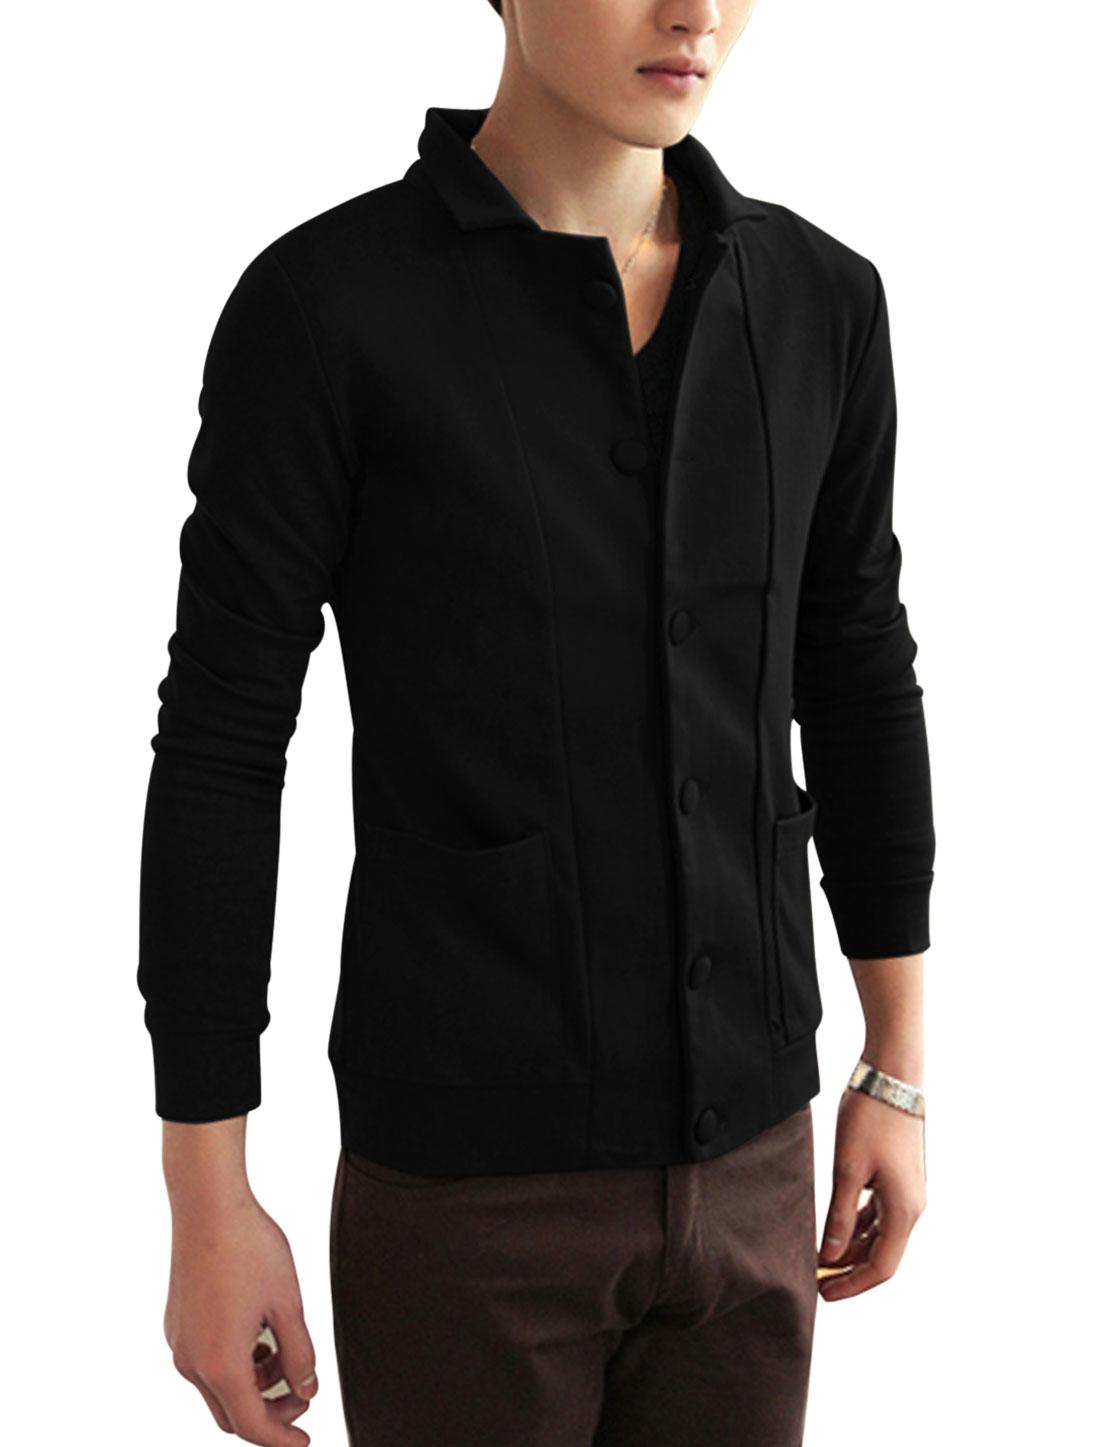 New Style Fashion Dobule Seam Pocket Front Jacket for Men Black M